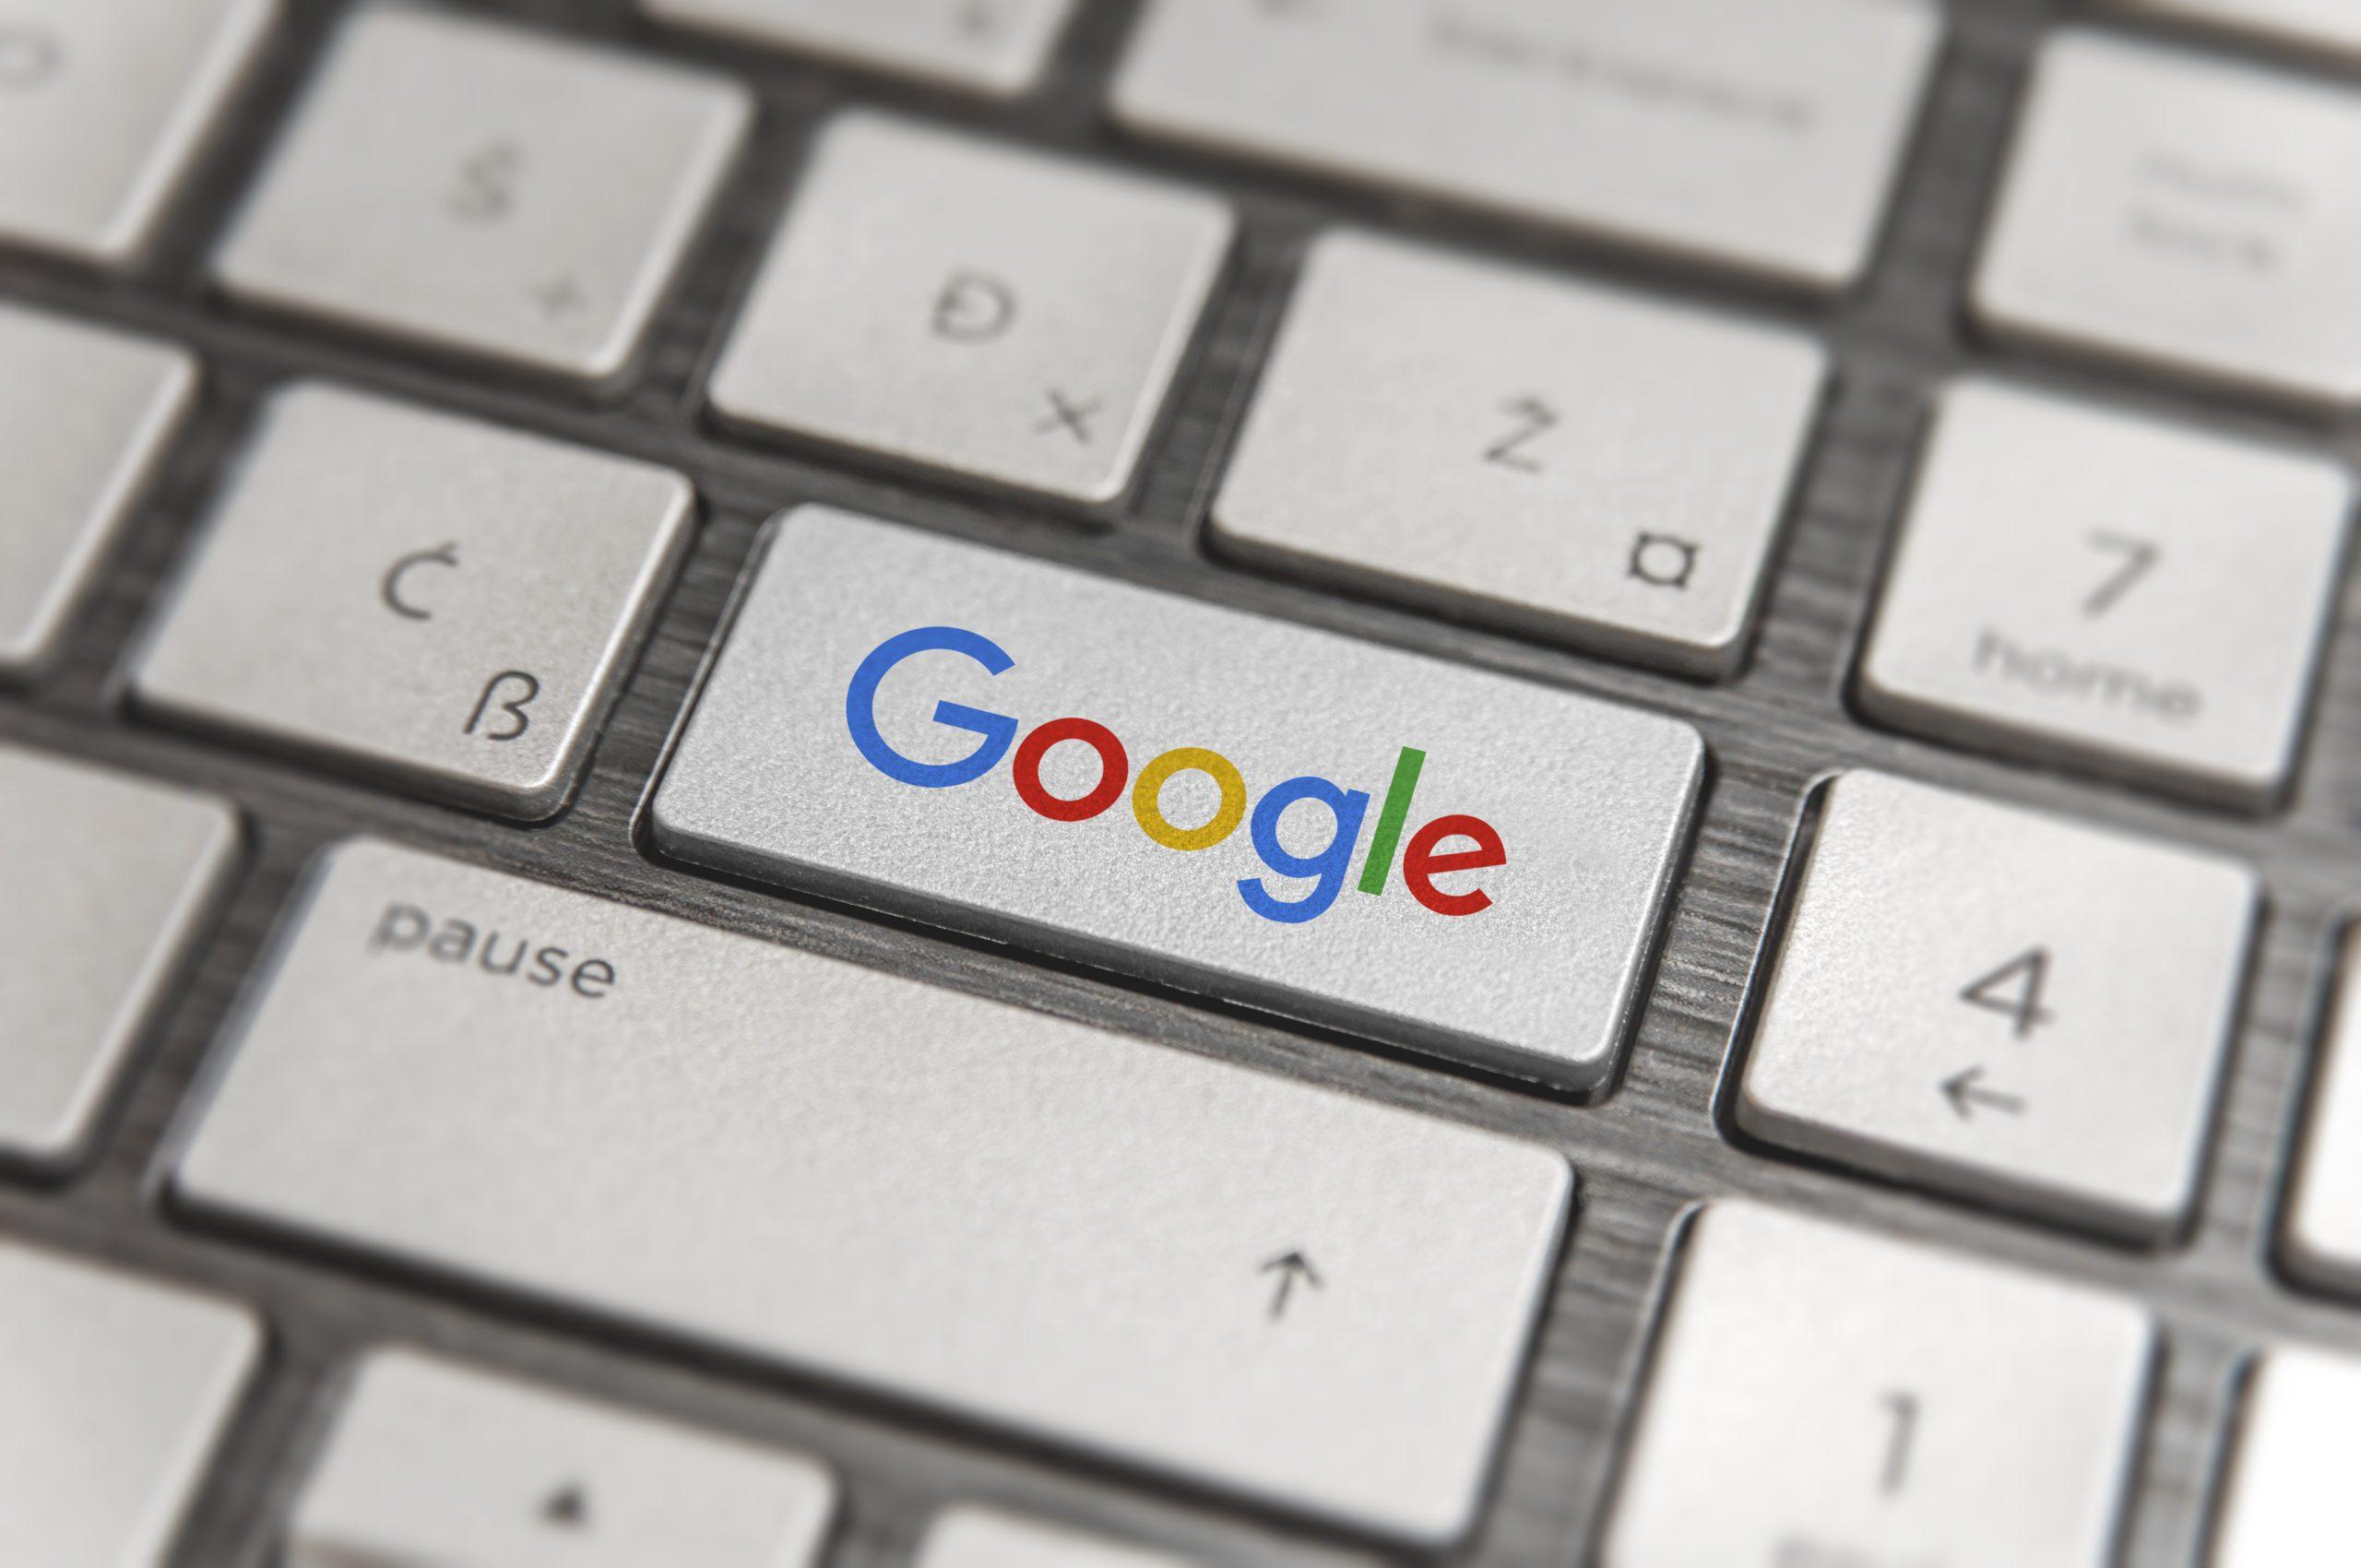 A keyboard with a Google key.